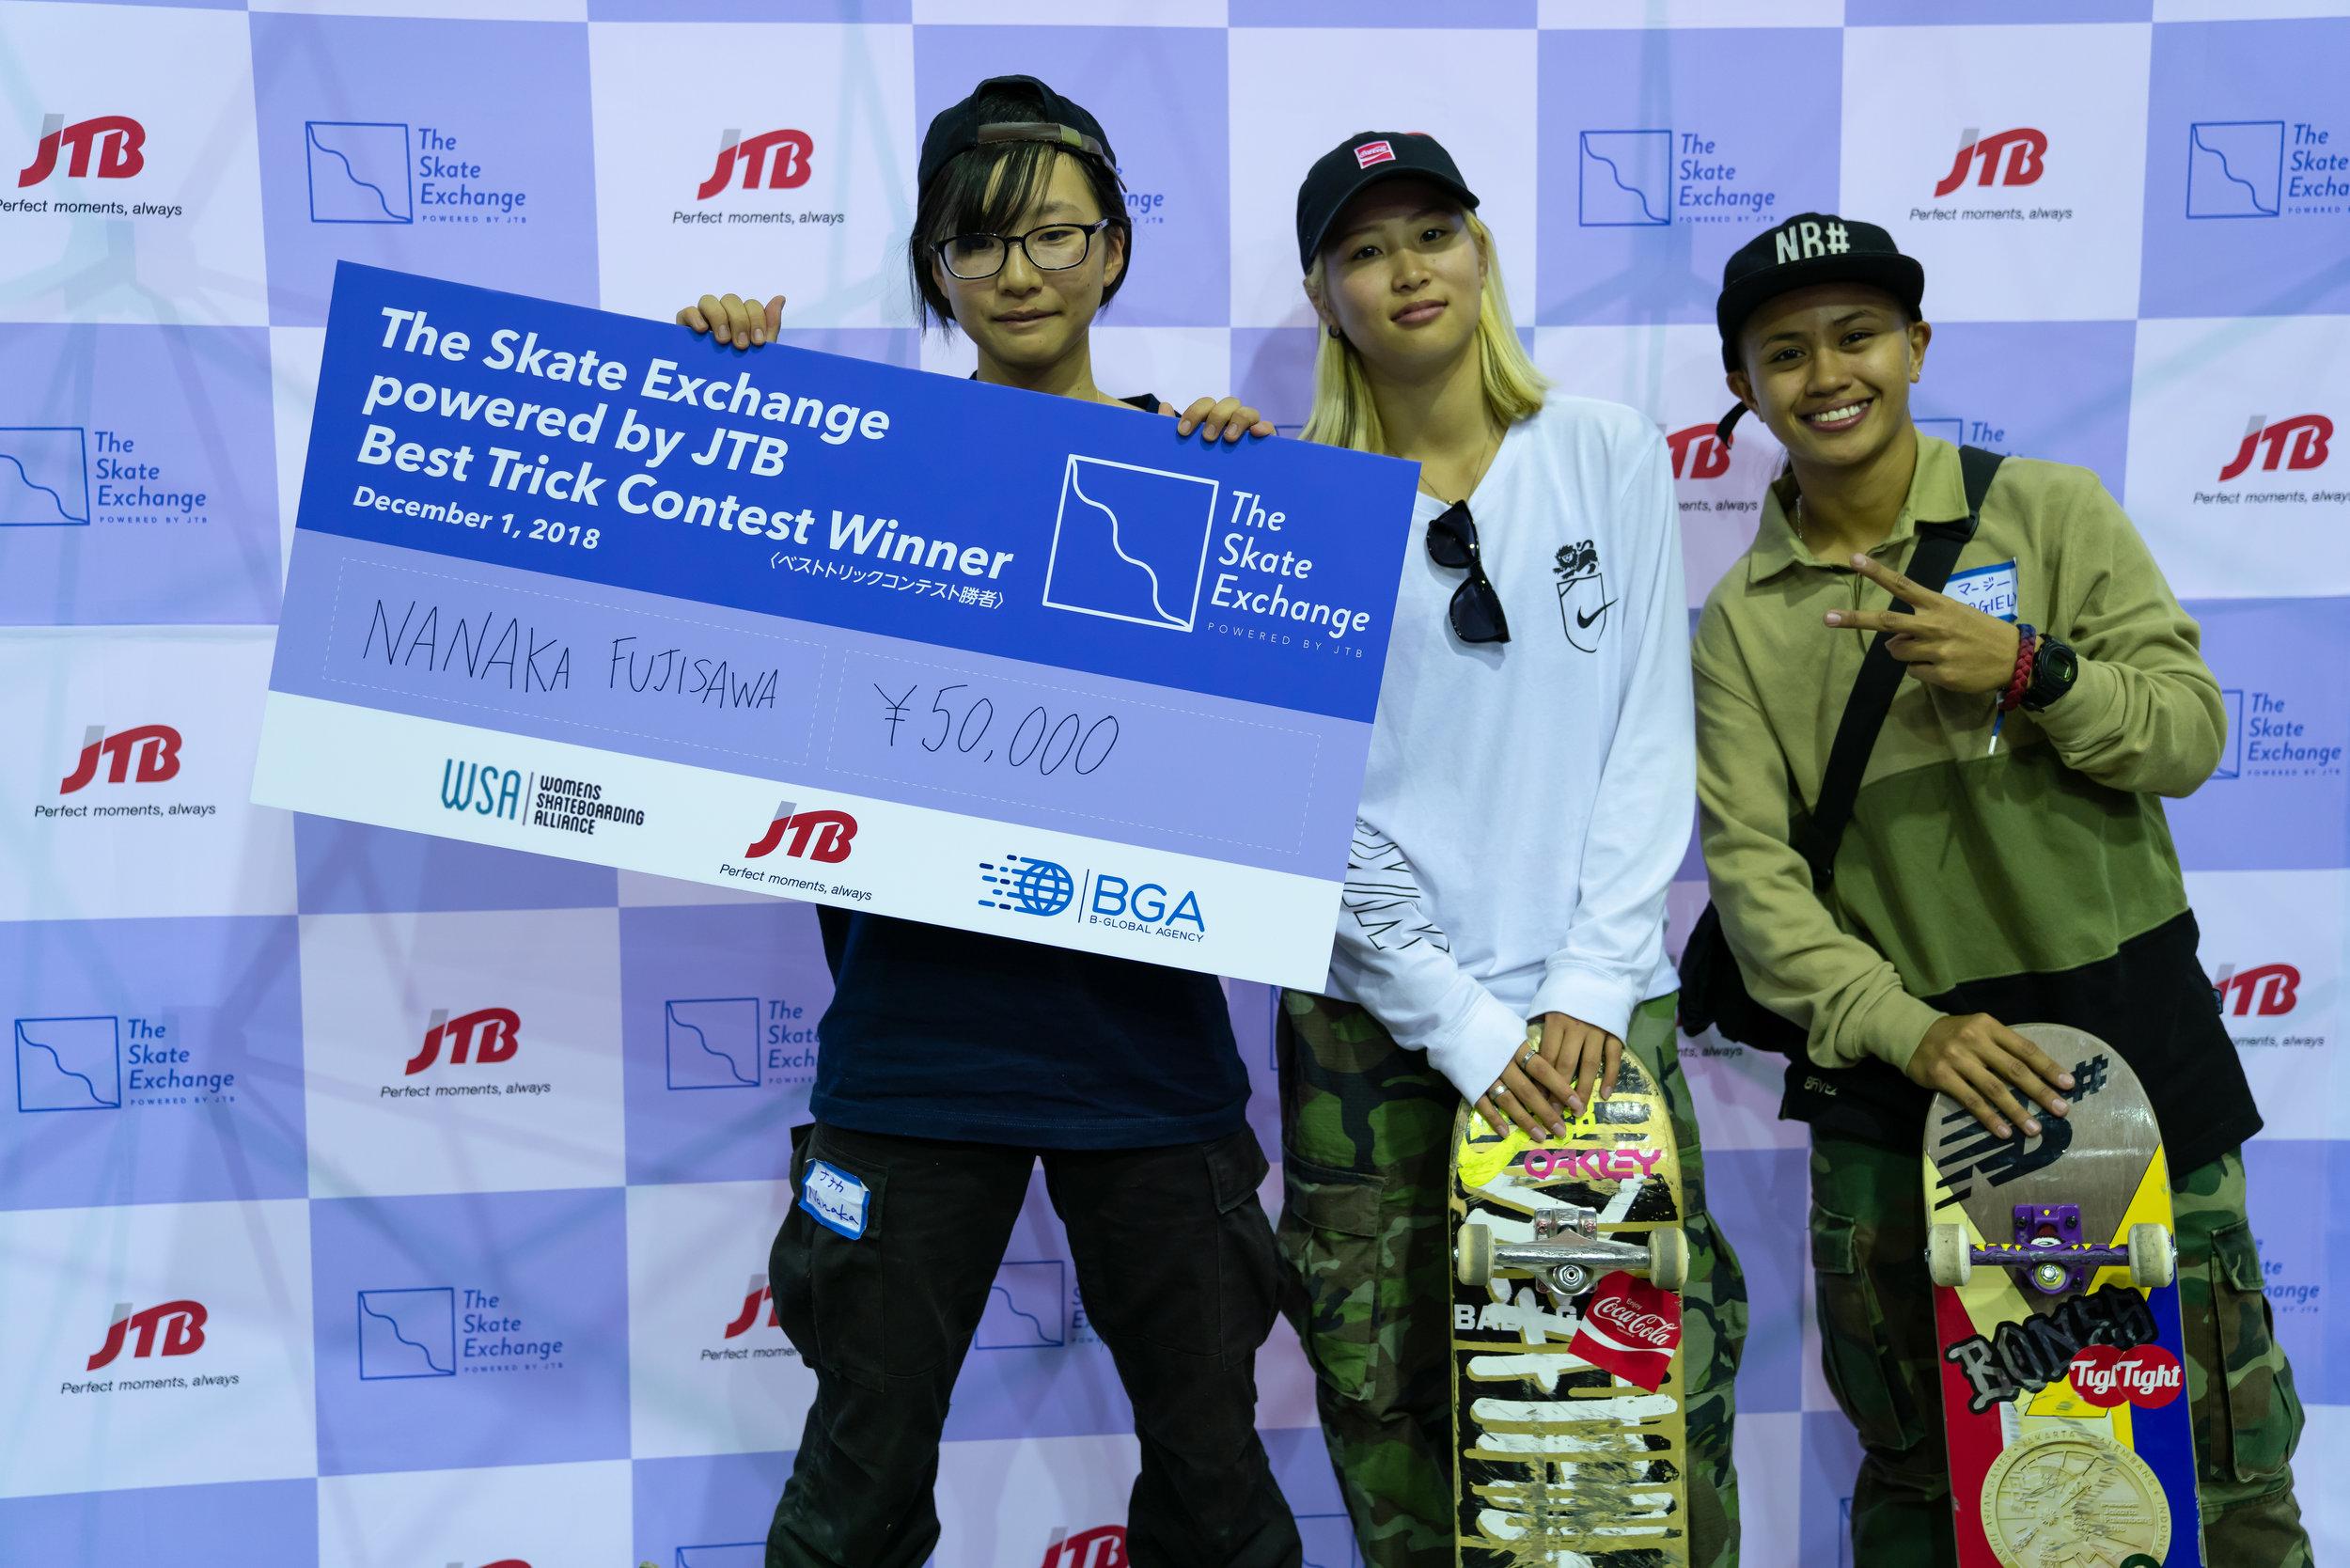 Skate Exchange3_Event Day Japan 2018_hannah bailey00010.jpg